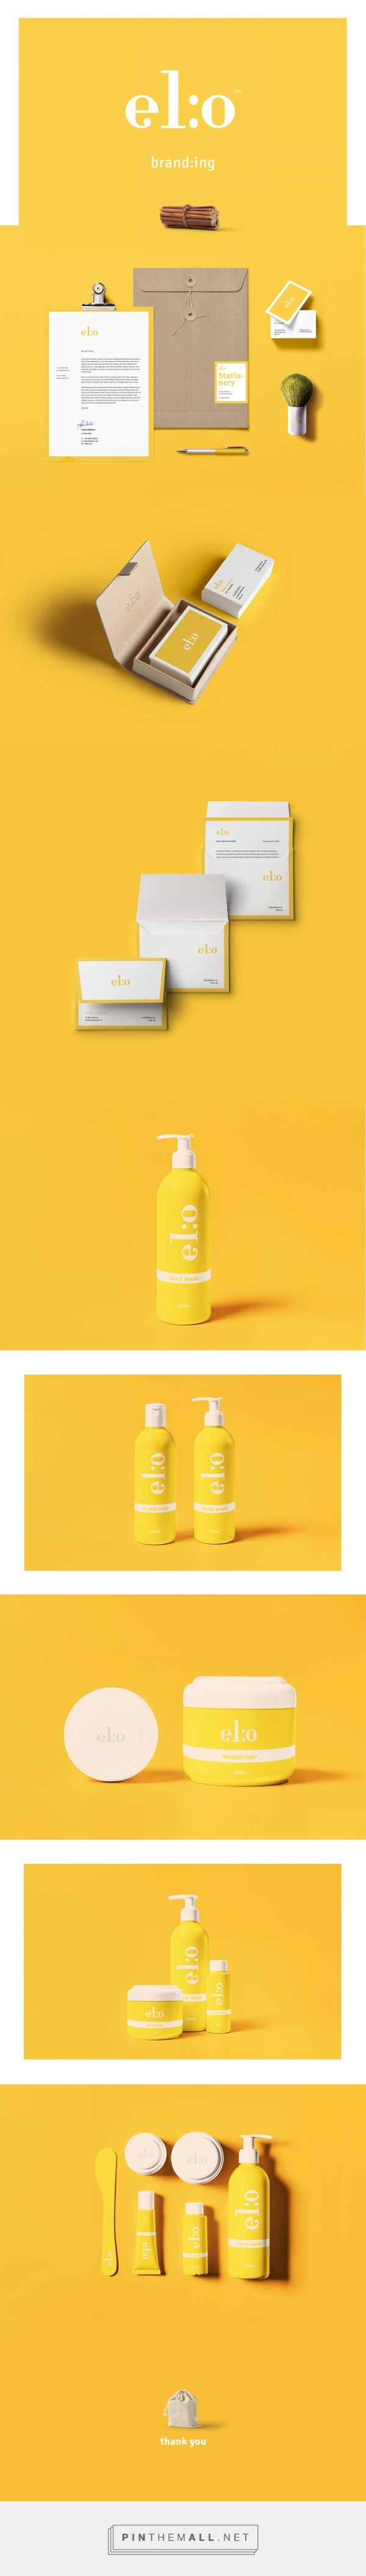 el:o Branding by Felix Joy on Behance | Fivestar Branding – Design and Branding…